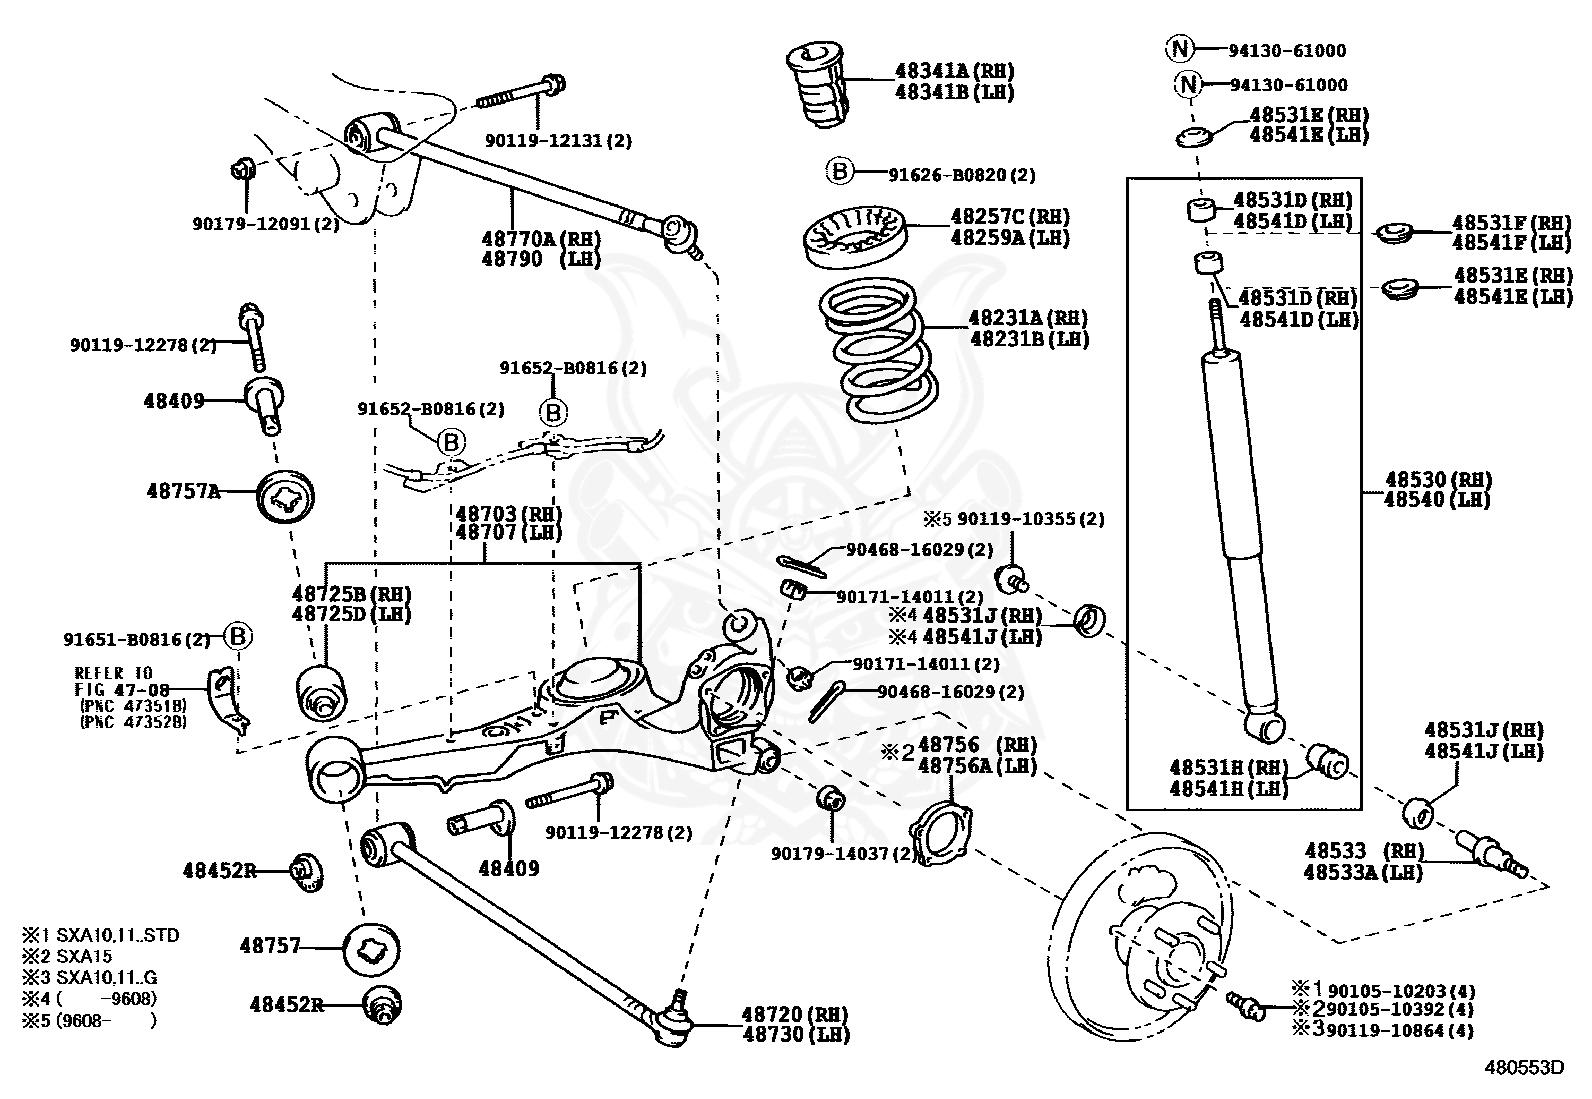 1999 Toyota Rav4 Shop Service Repair Manual Book Engine Drivetrain OEM